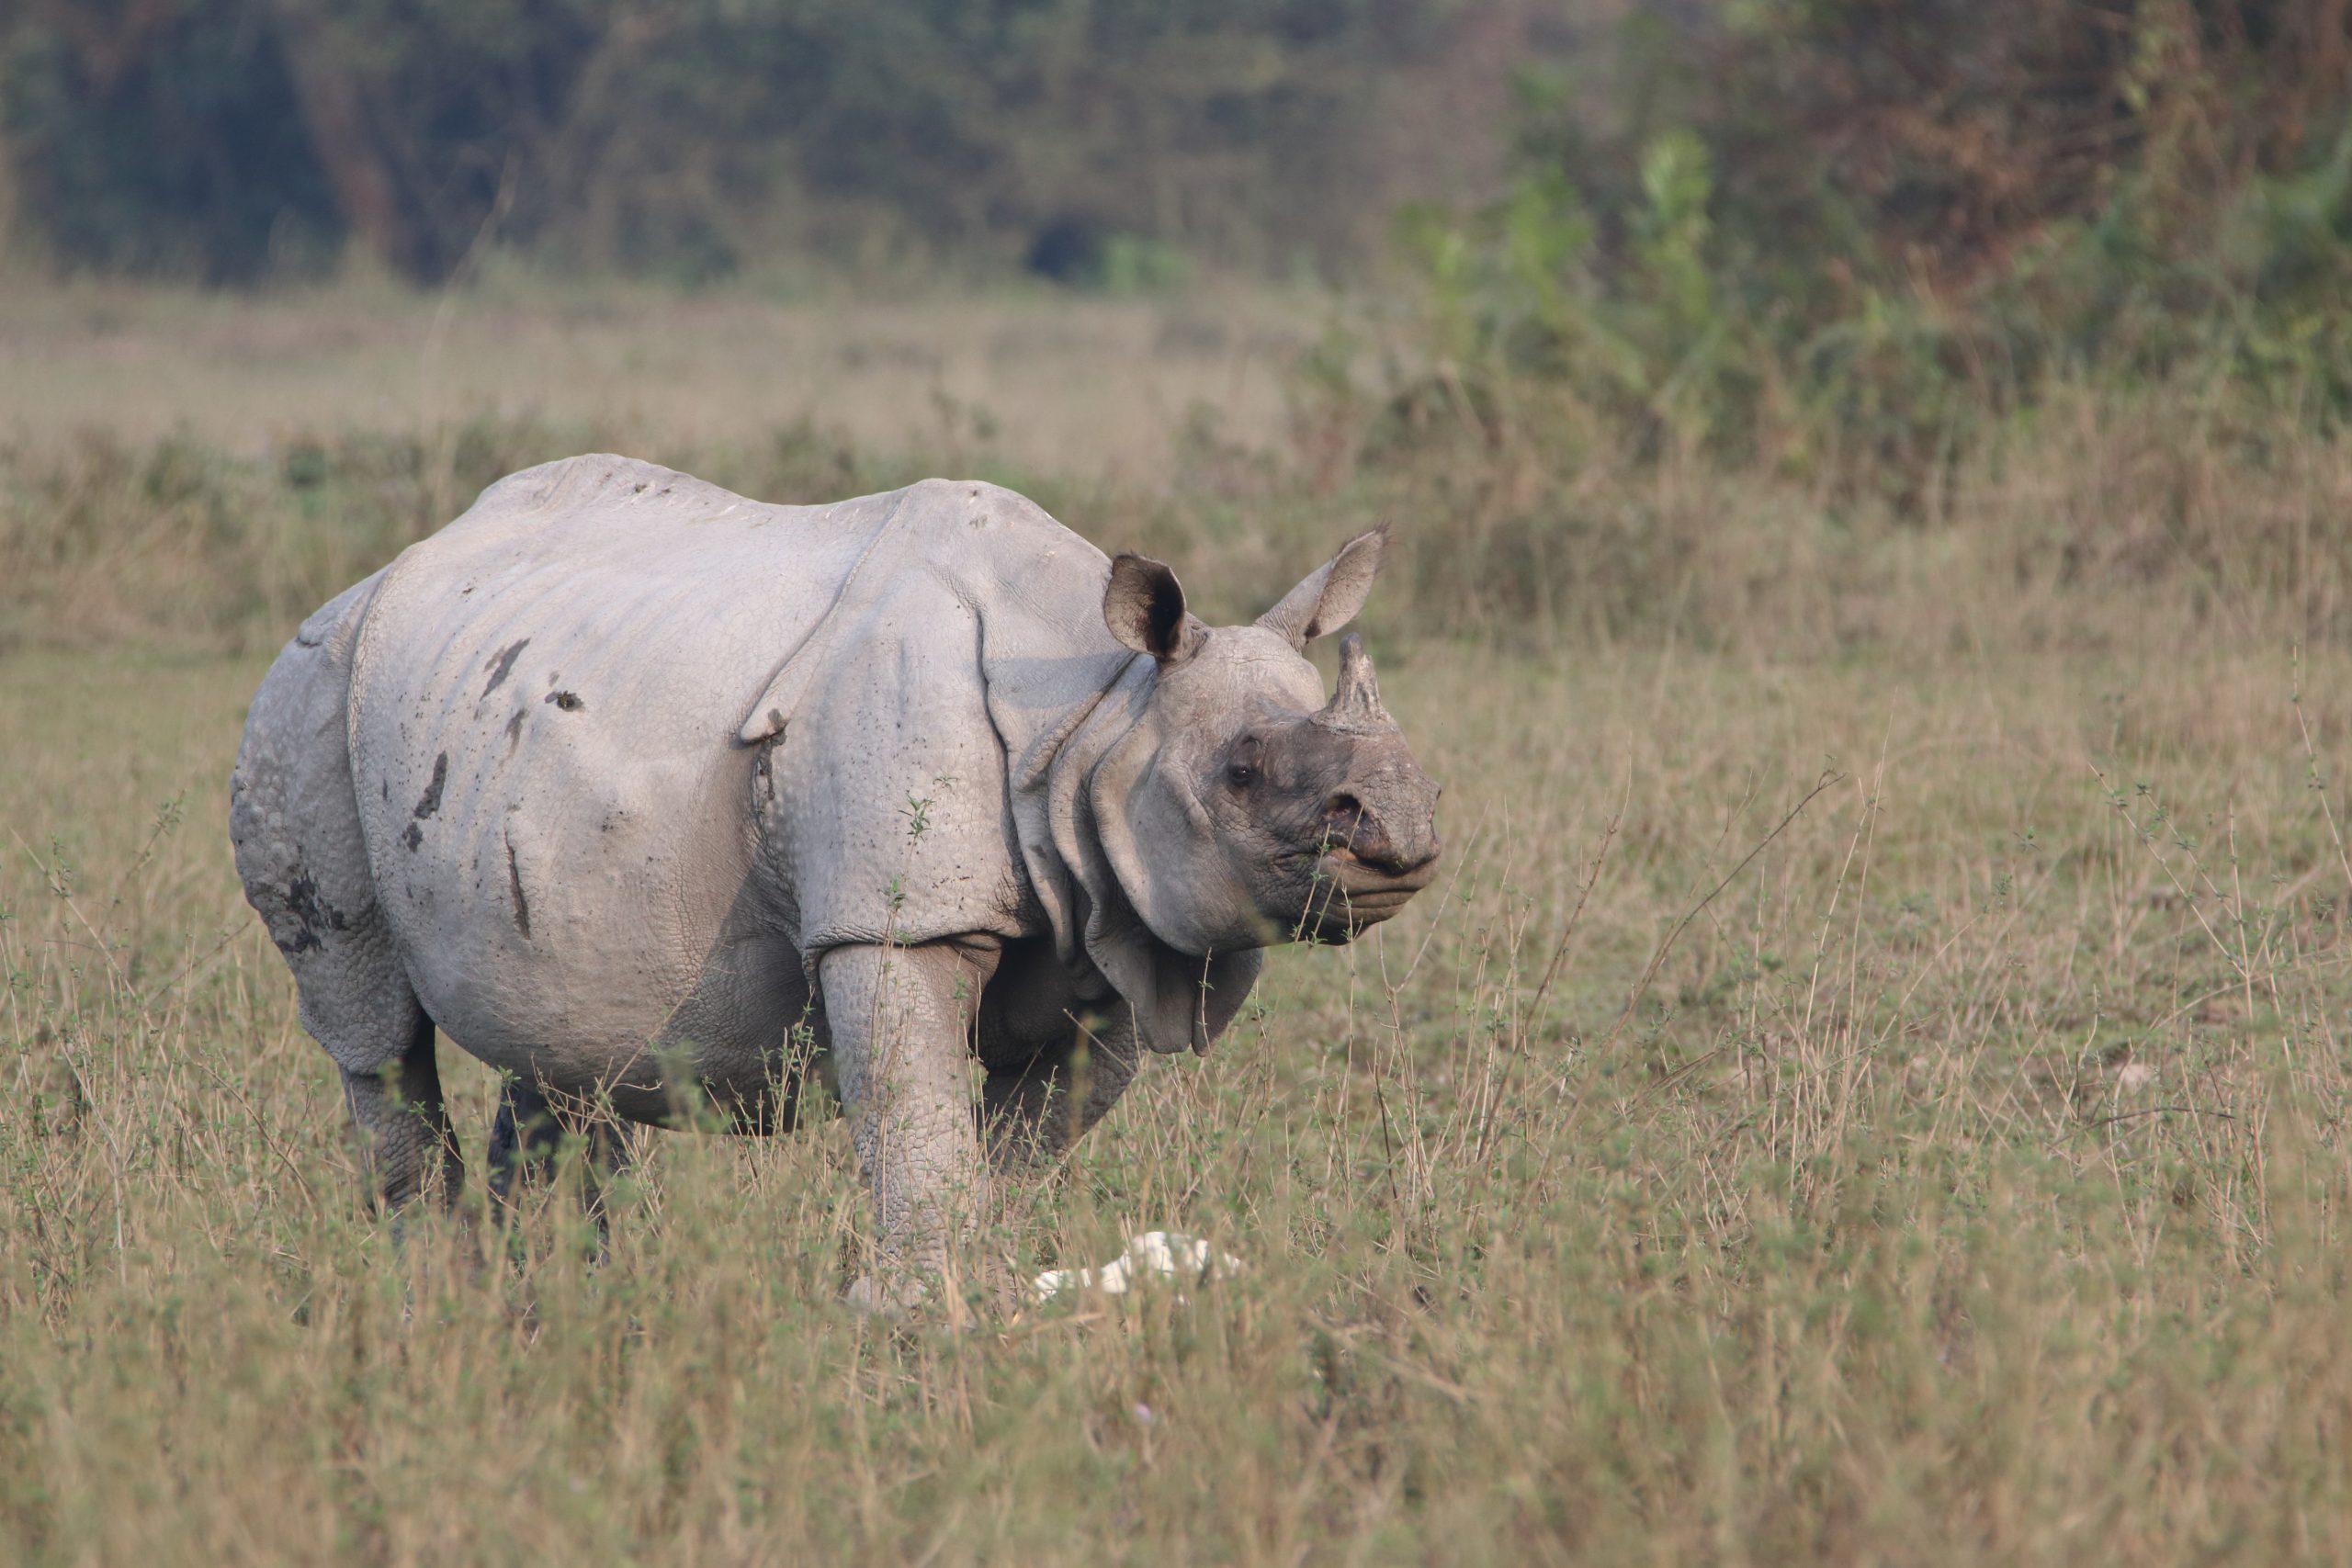 Rhinoceros Walking on the Grass